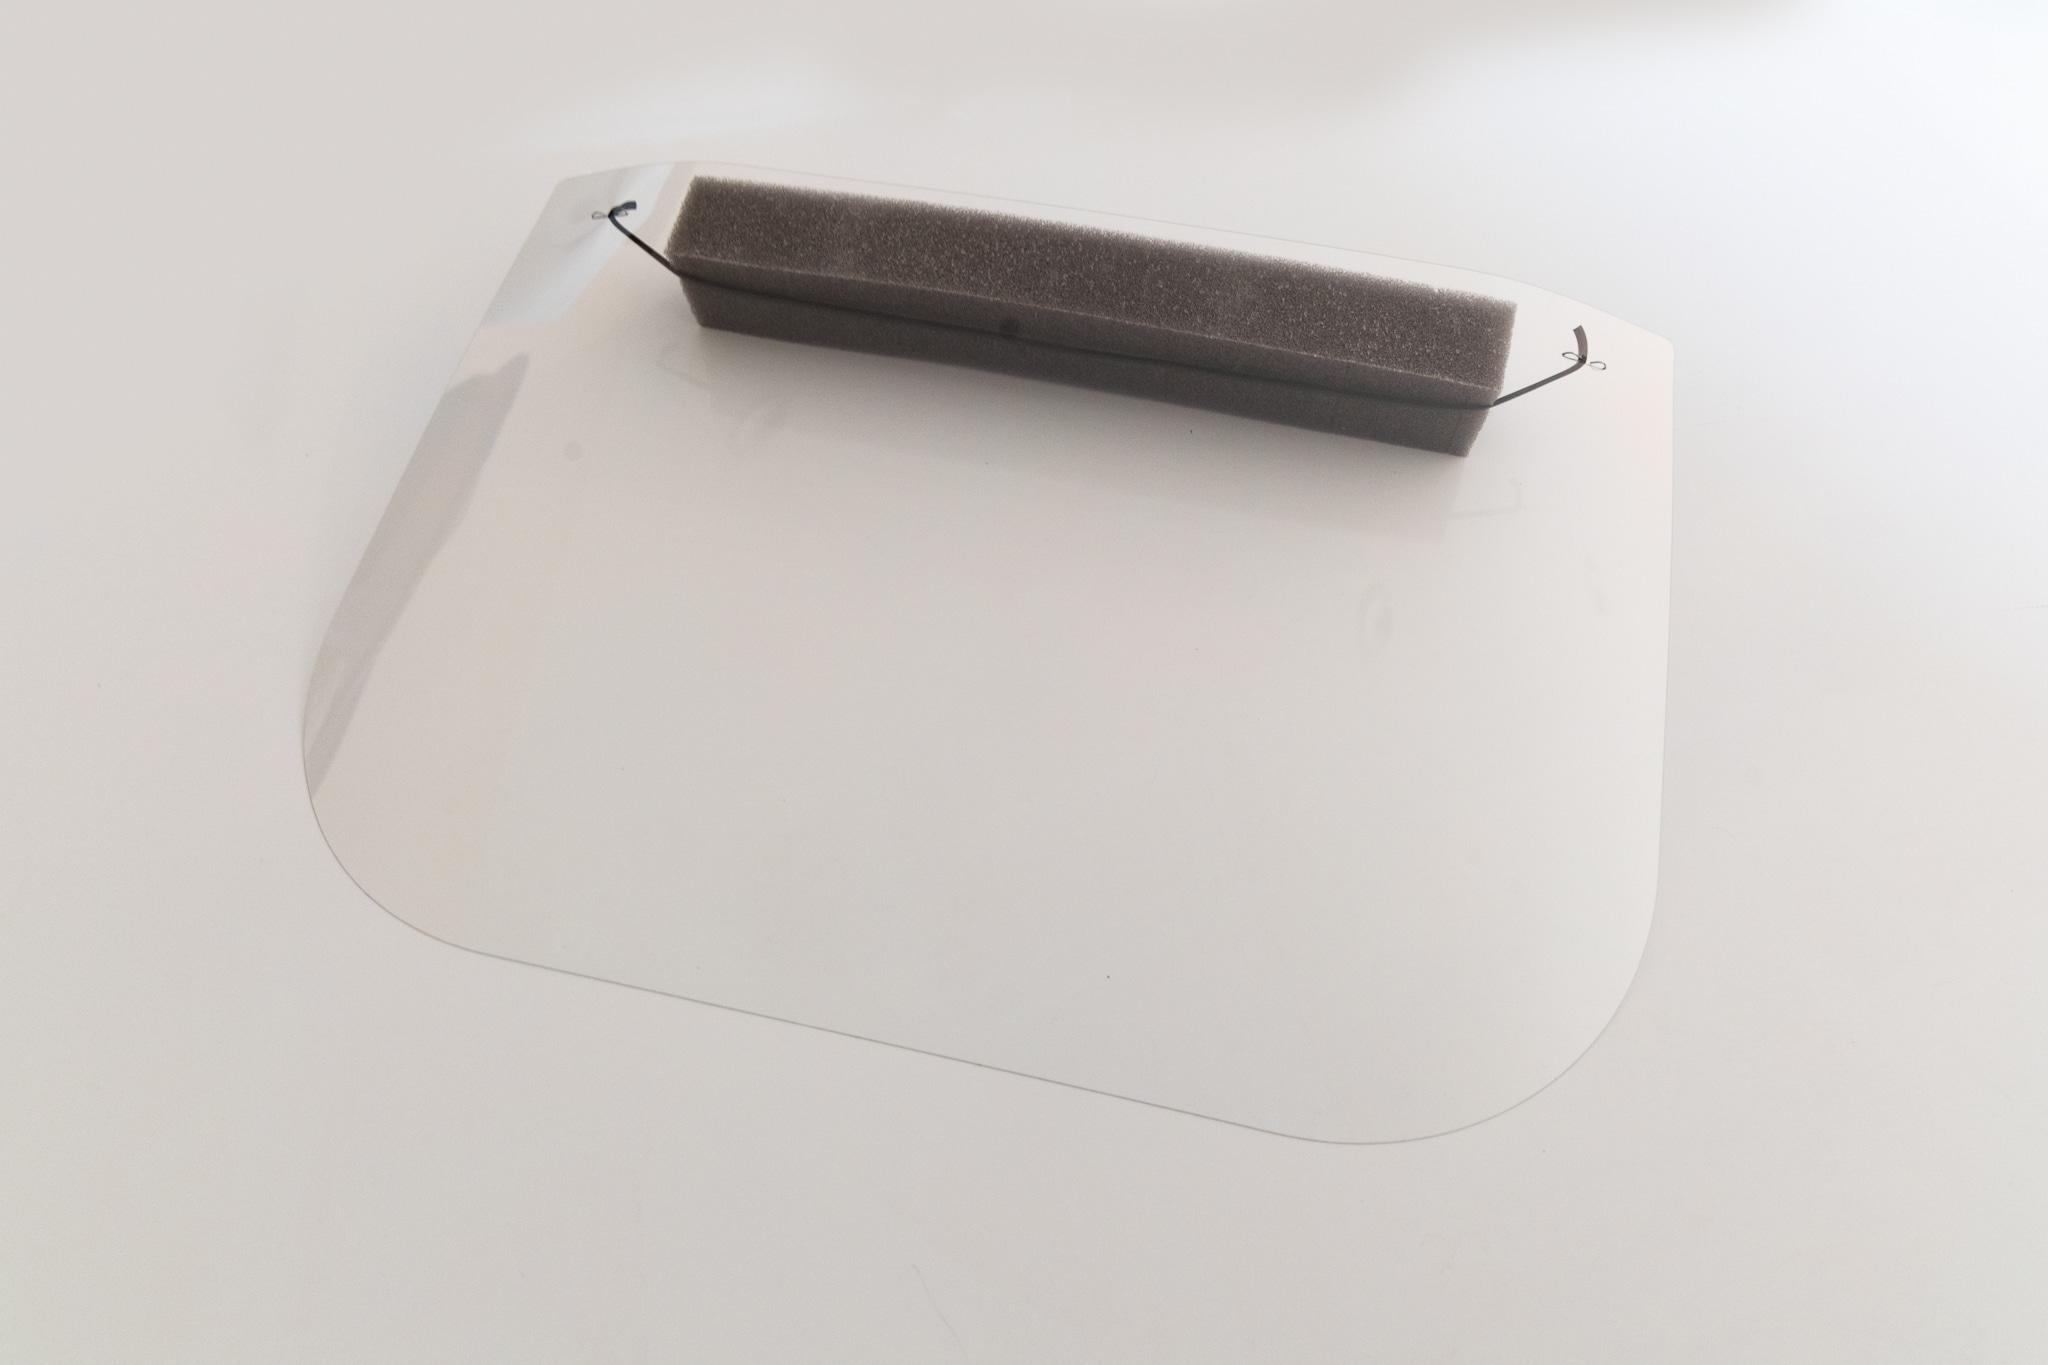 GEN1 Single-Use Disposable Face Shield